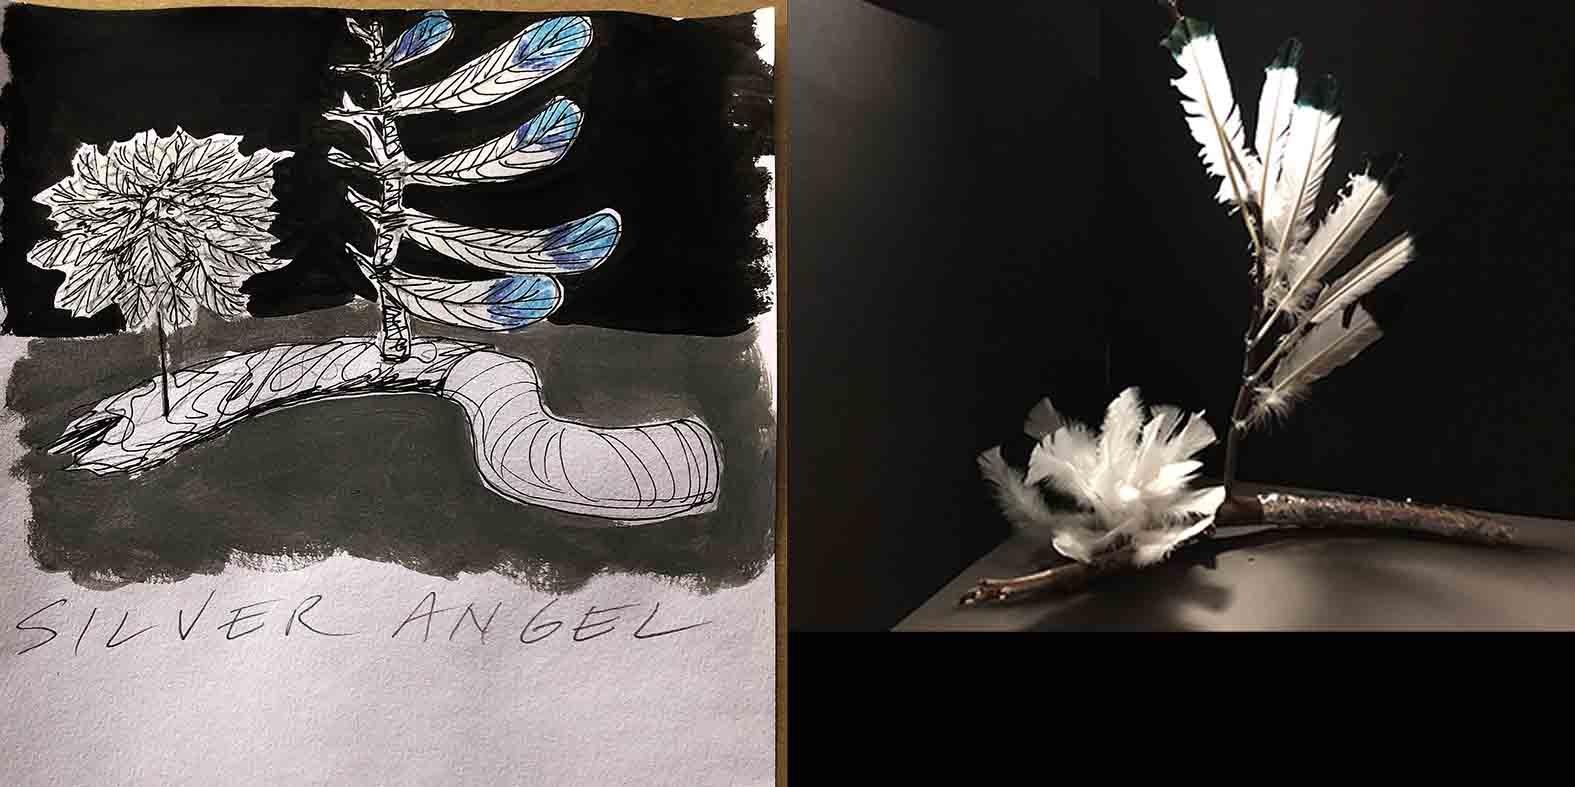 Silver Angel Wing illustration and mock up design